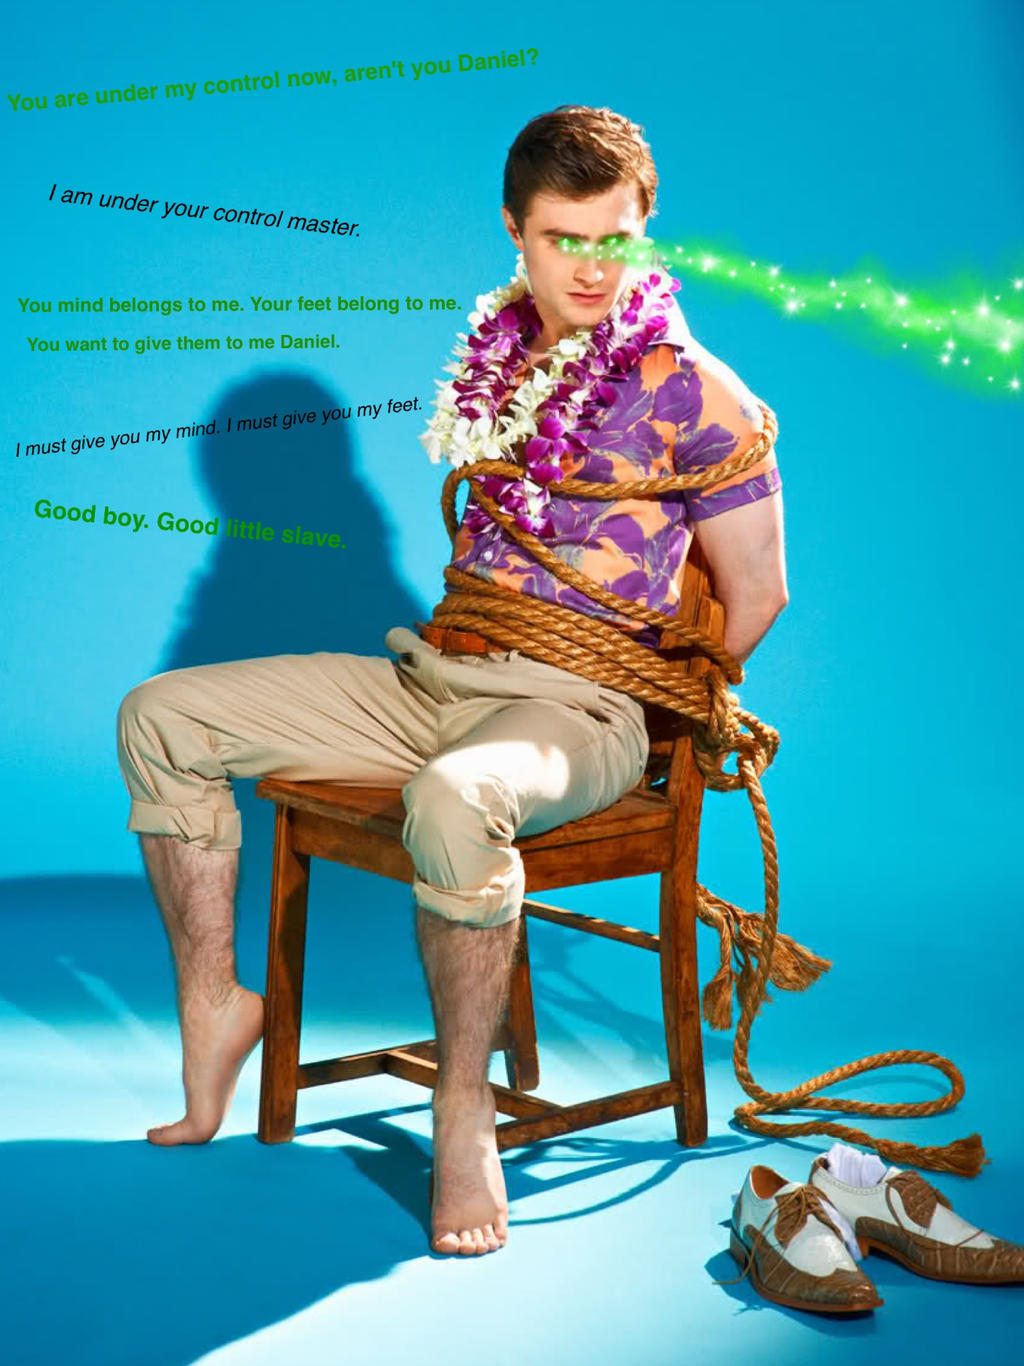 Daniel Radcliffe Enthralled by hypnox77 on DeviantArt Daniel Radcliffe Net